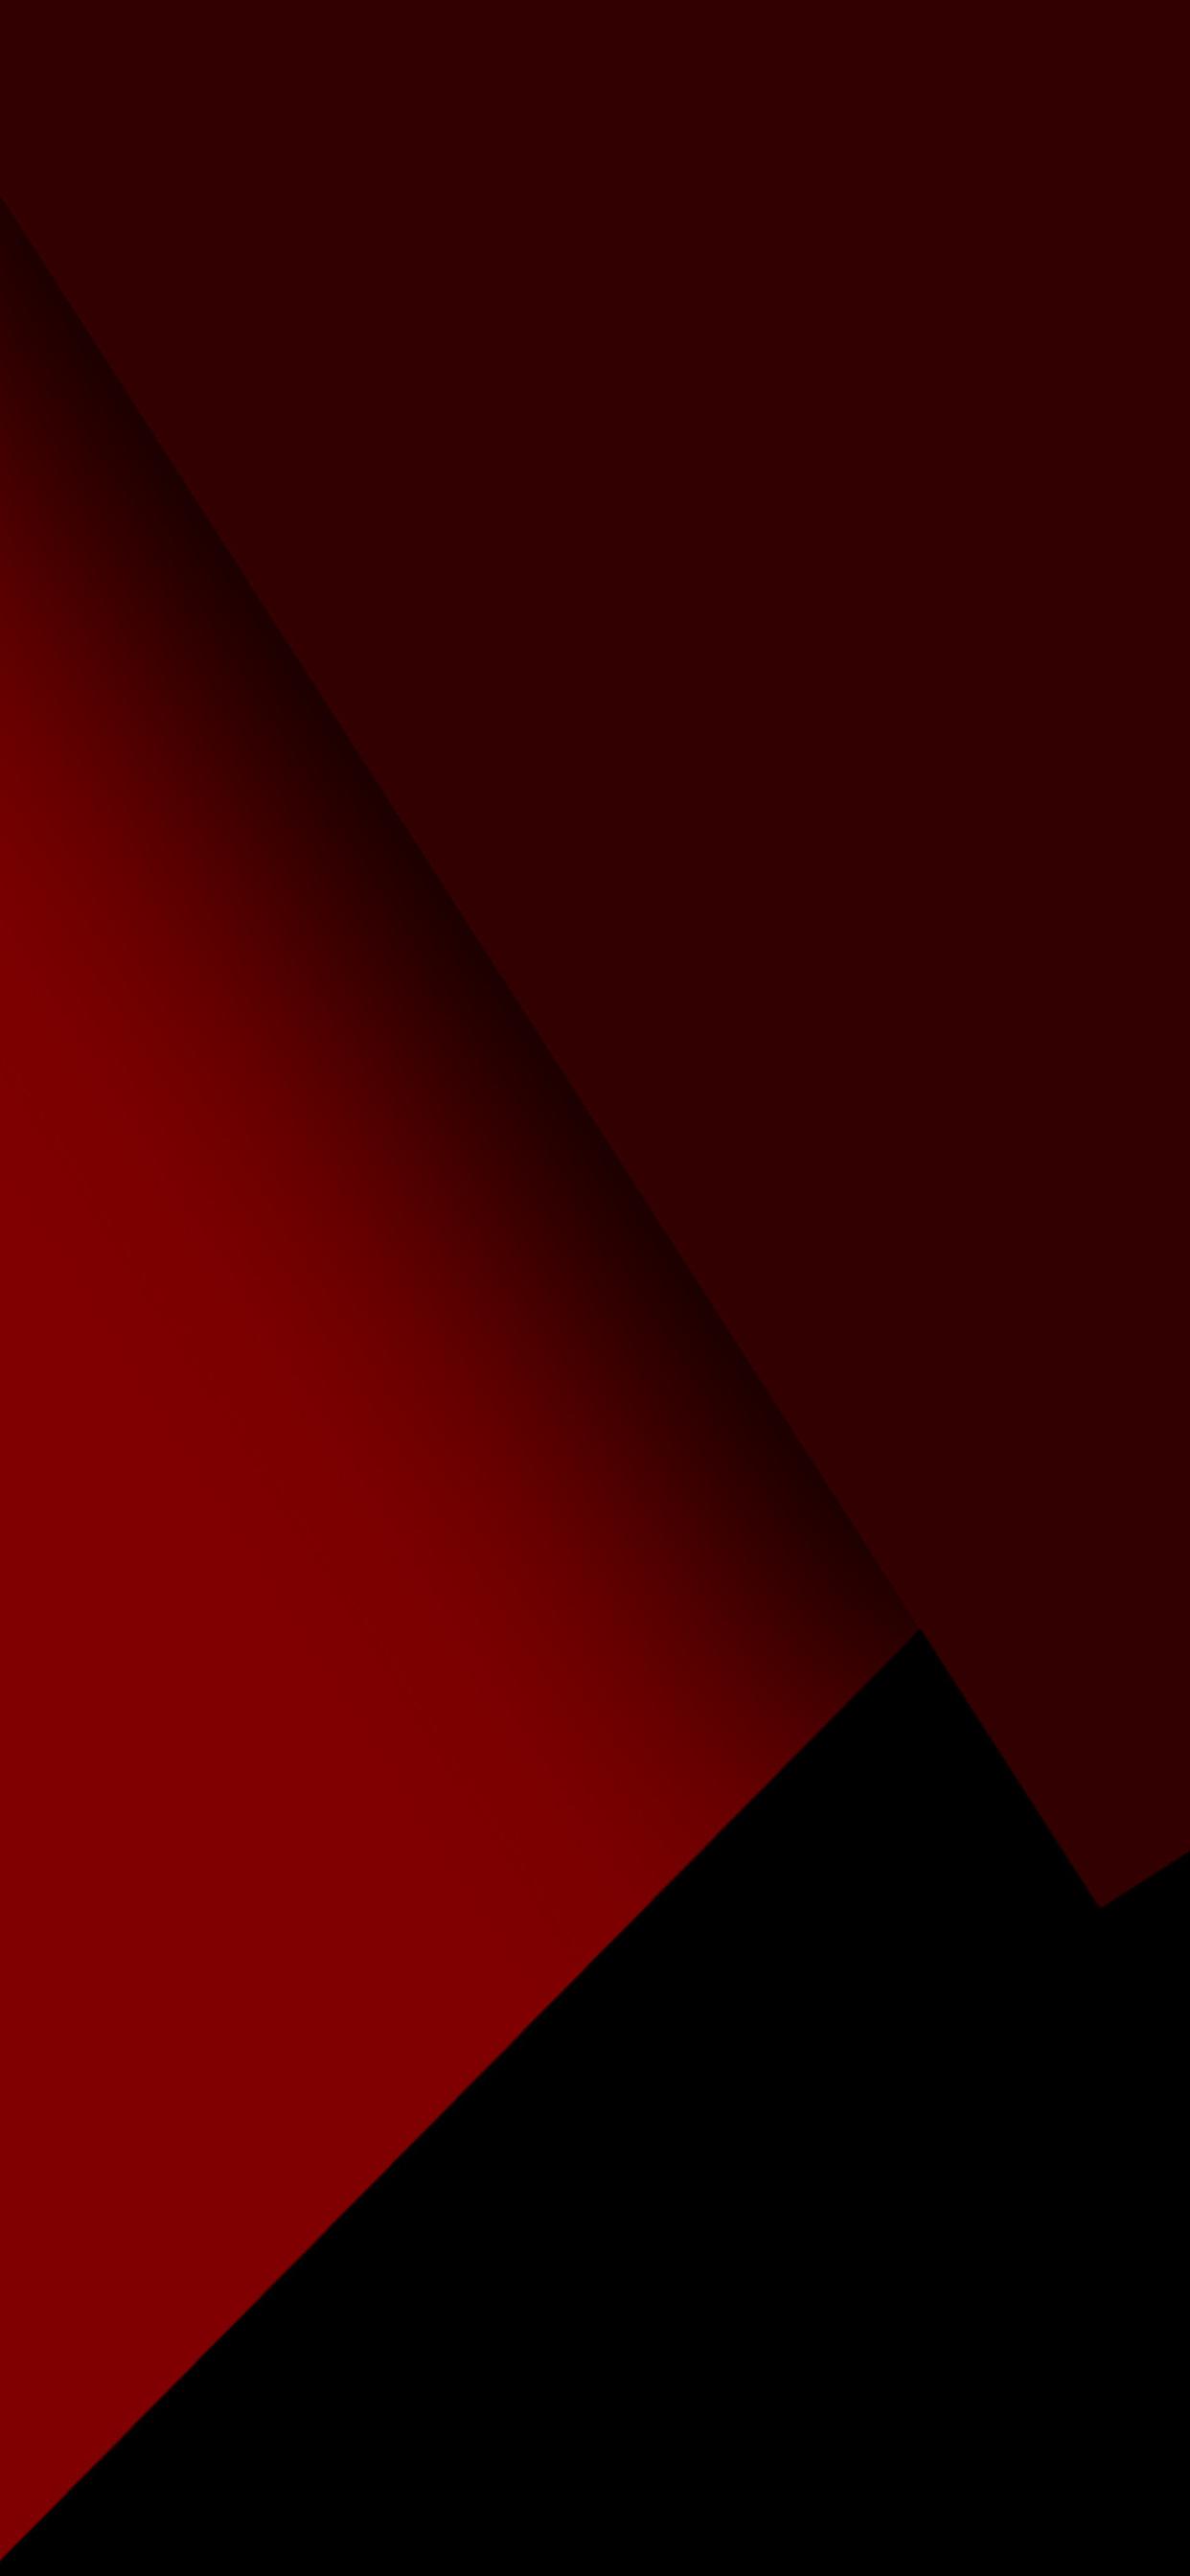 1242x2688 Dark Red Black Abstract 4k Iphone Xs Max Hd 4k